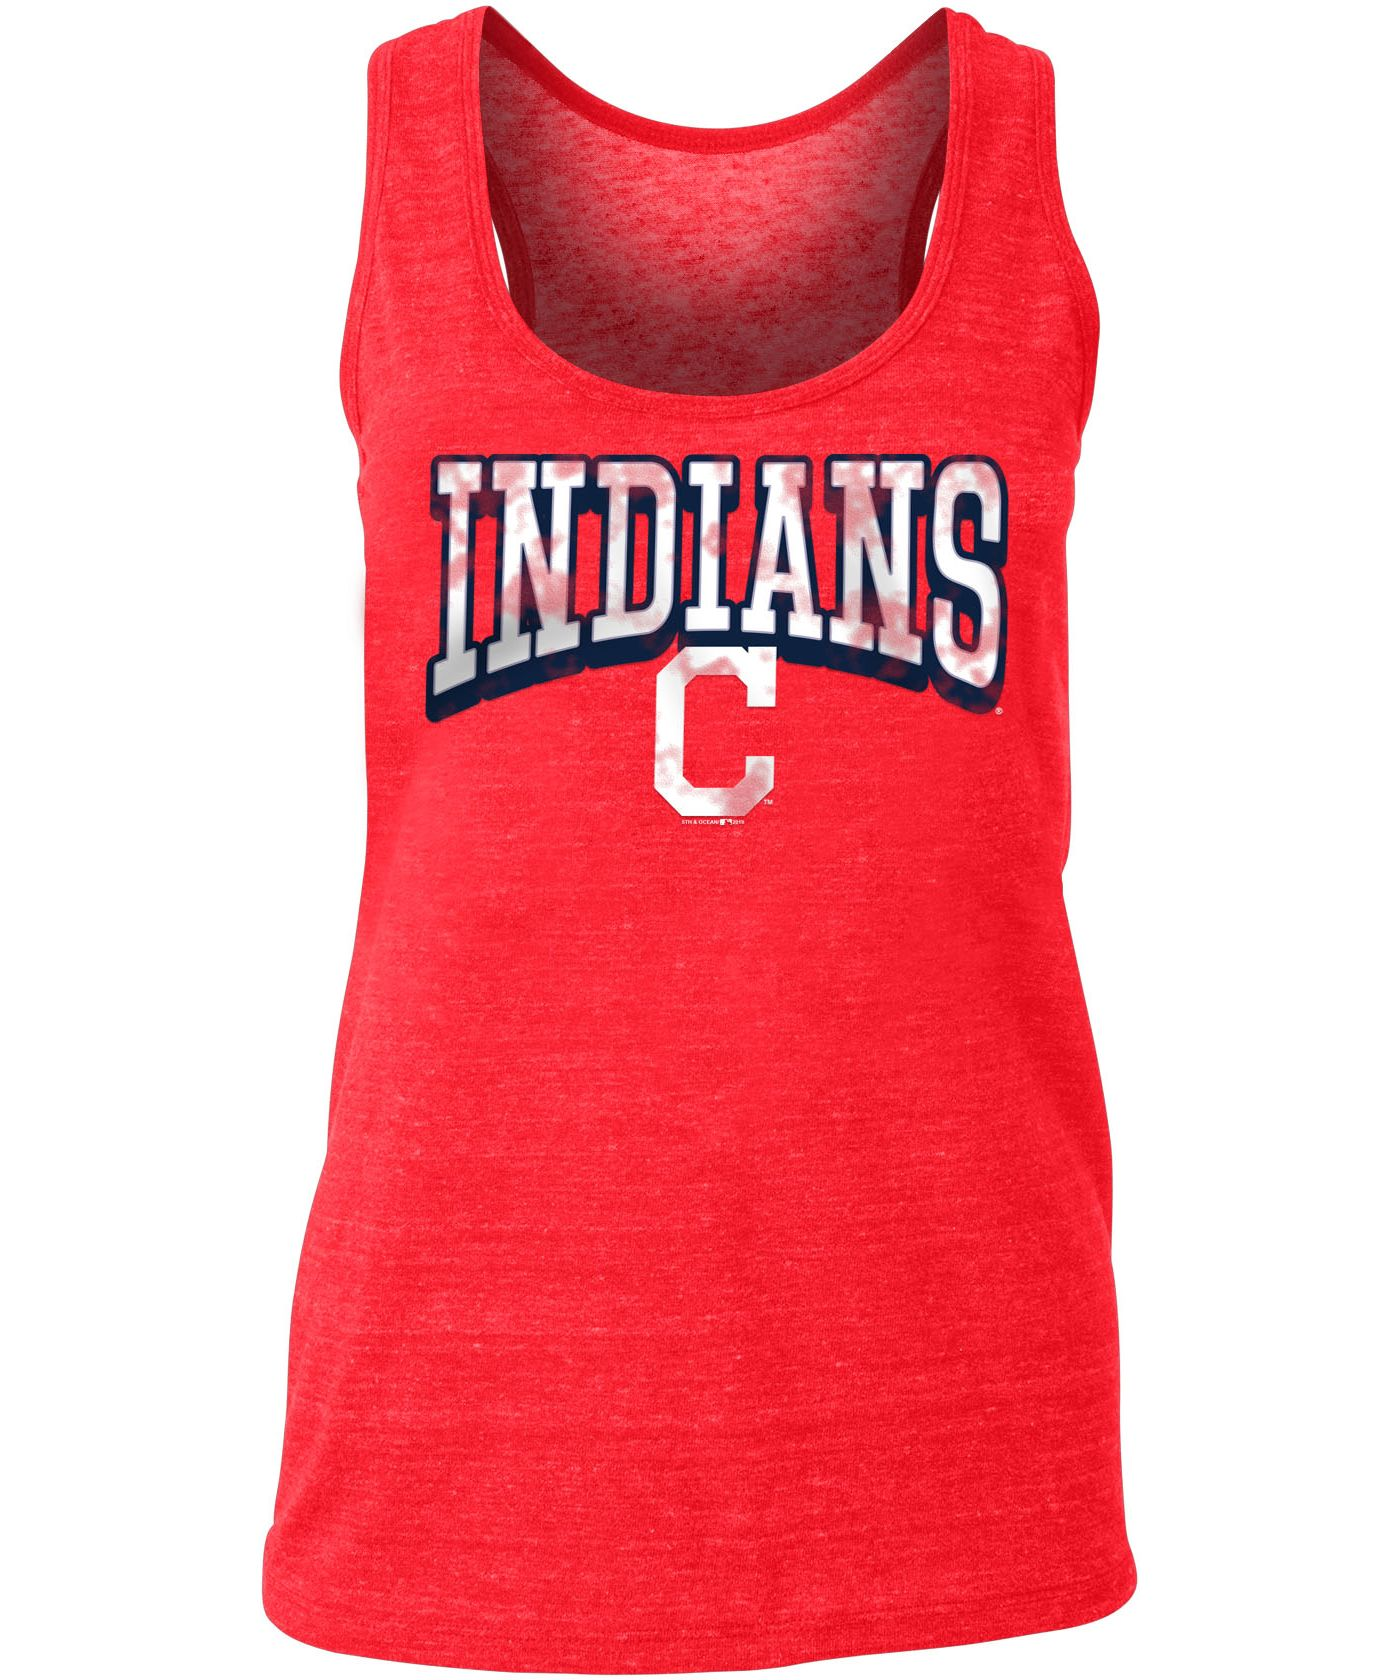 New Era Women's Cleveland Indians Tri-Blend Tank Top